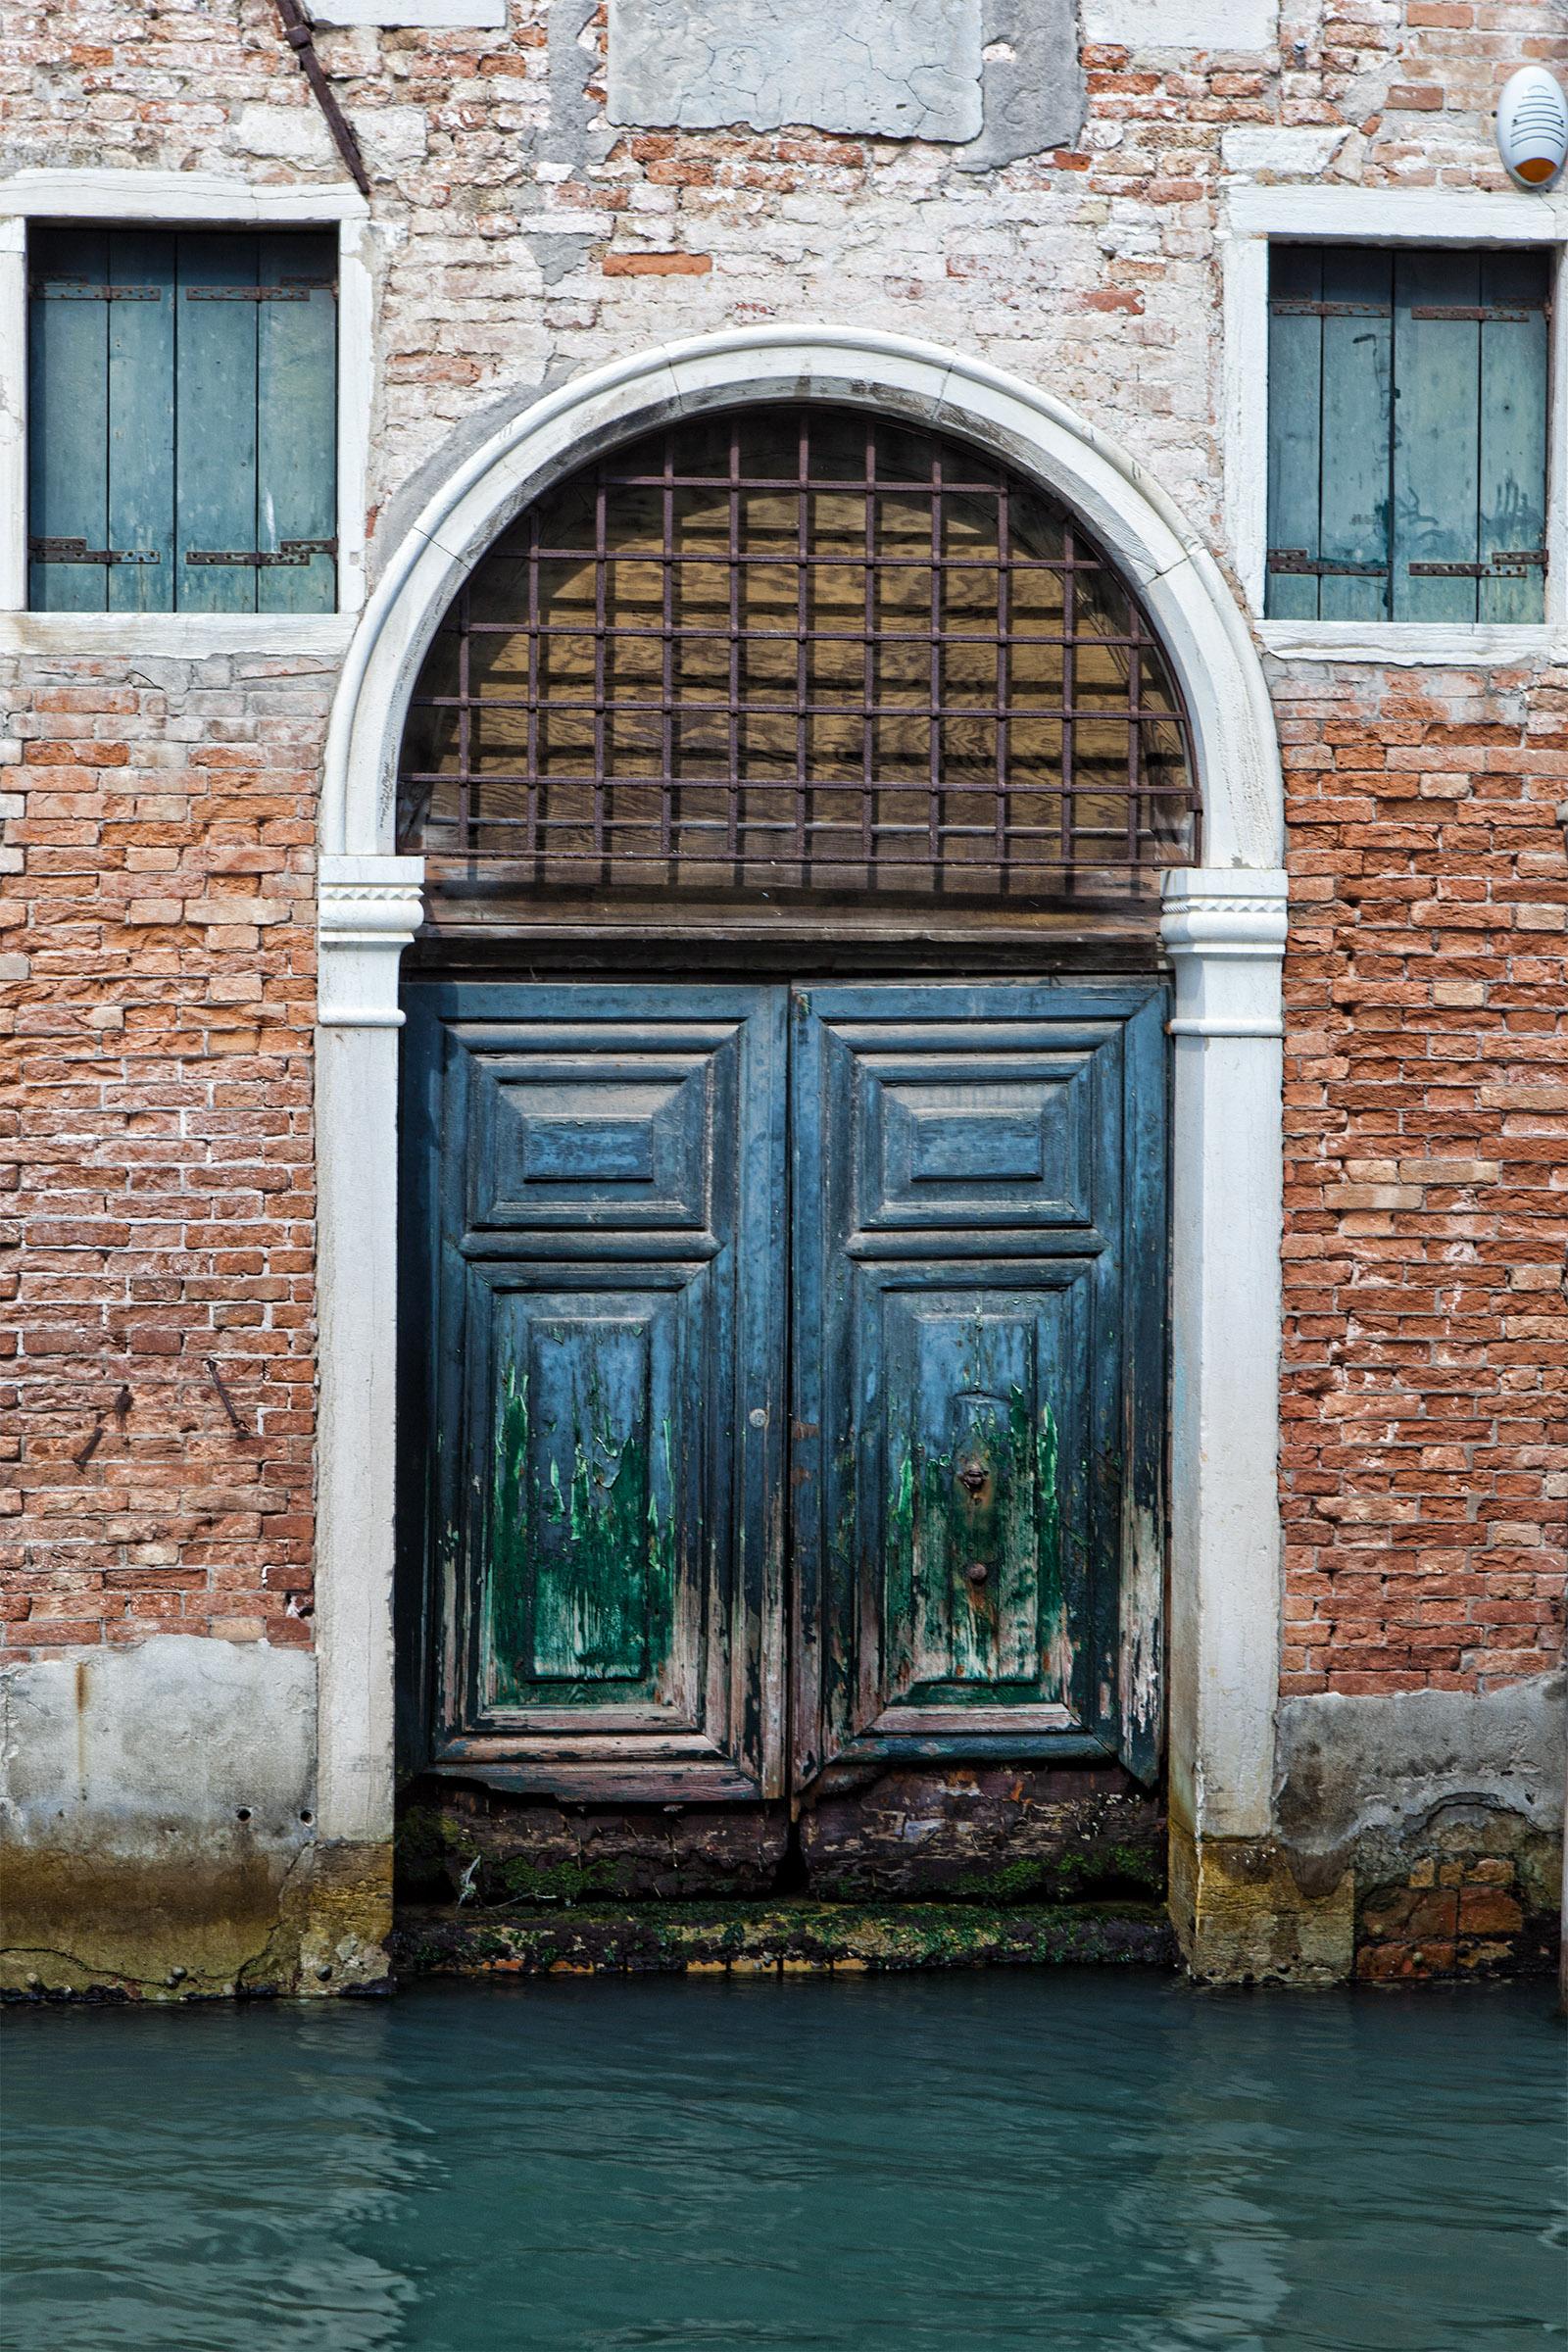 Doors, Adriatic, Tourism, Italy, Landmark, HQ Photo